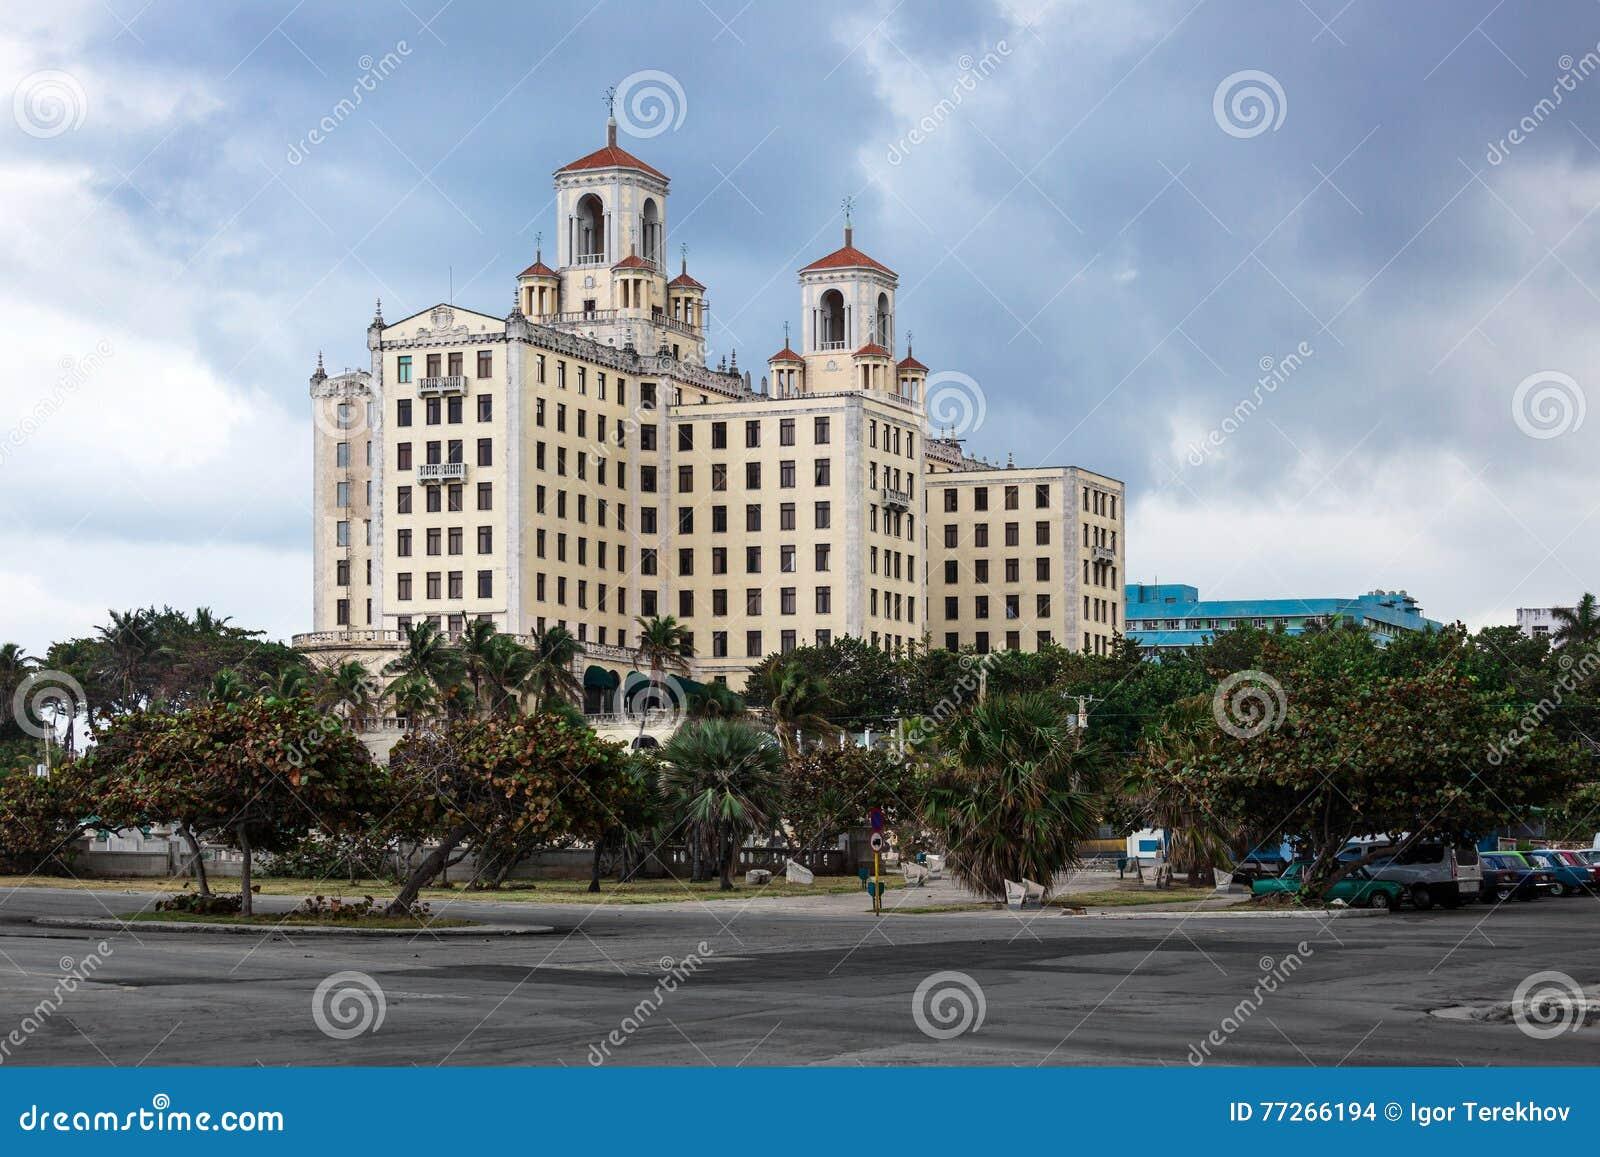 Hotelowy obywatel Kuba